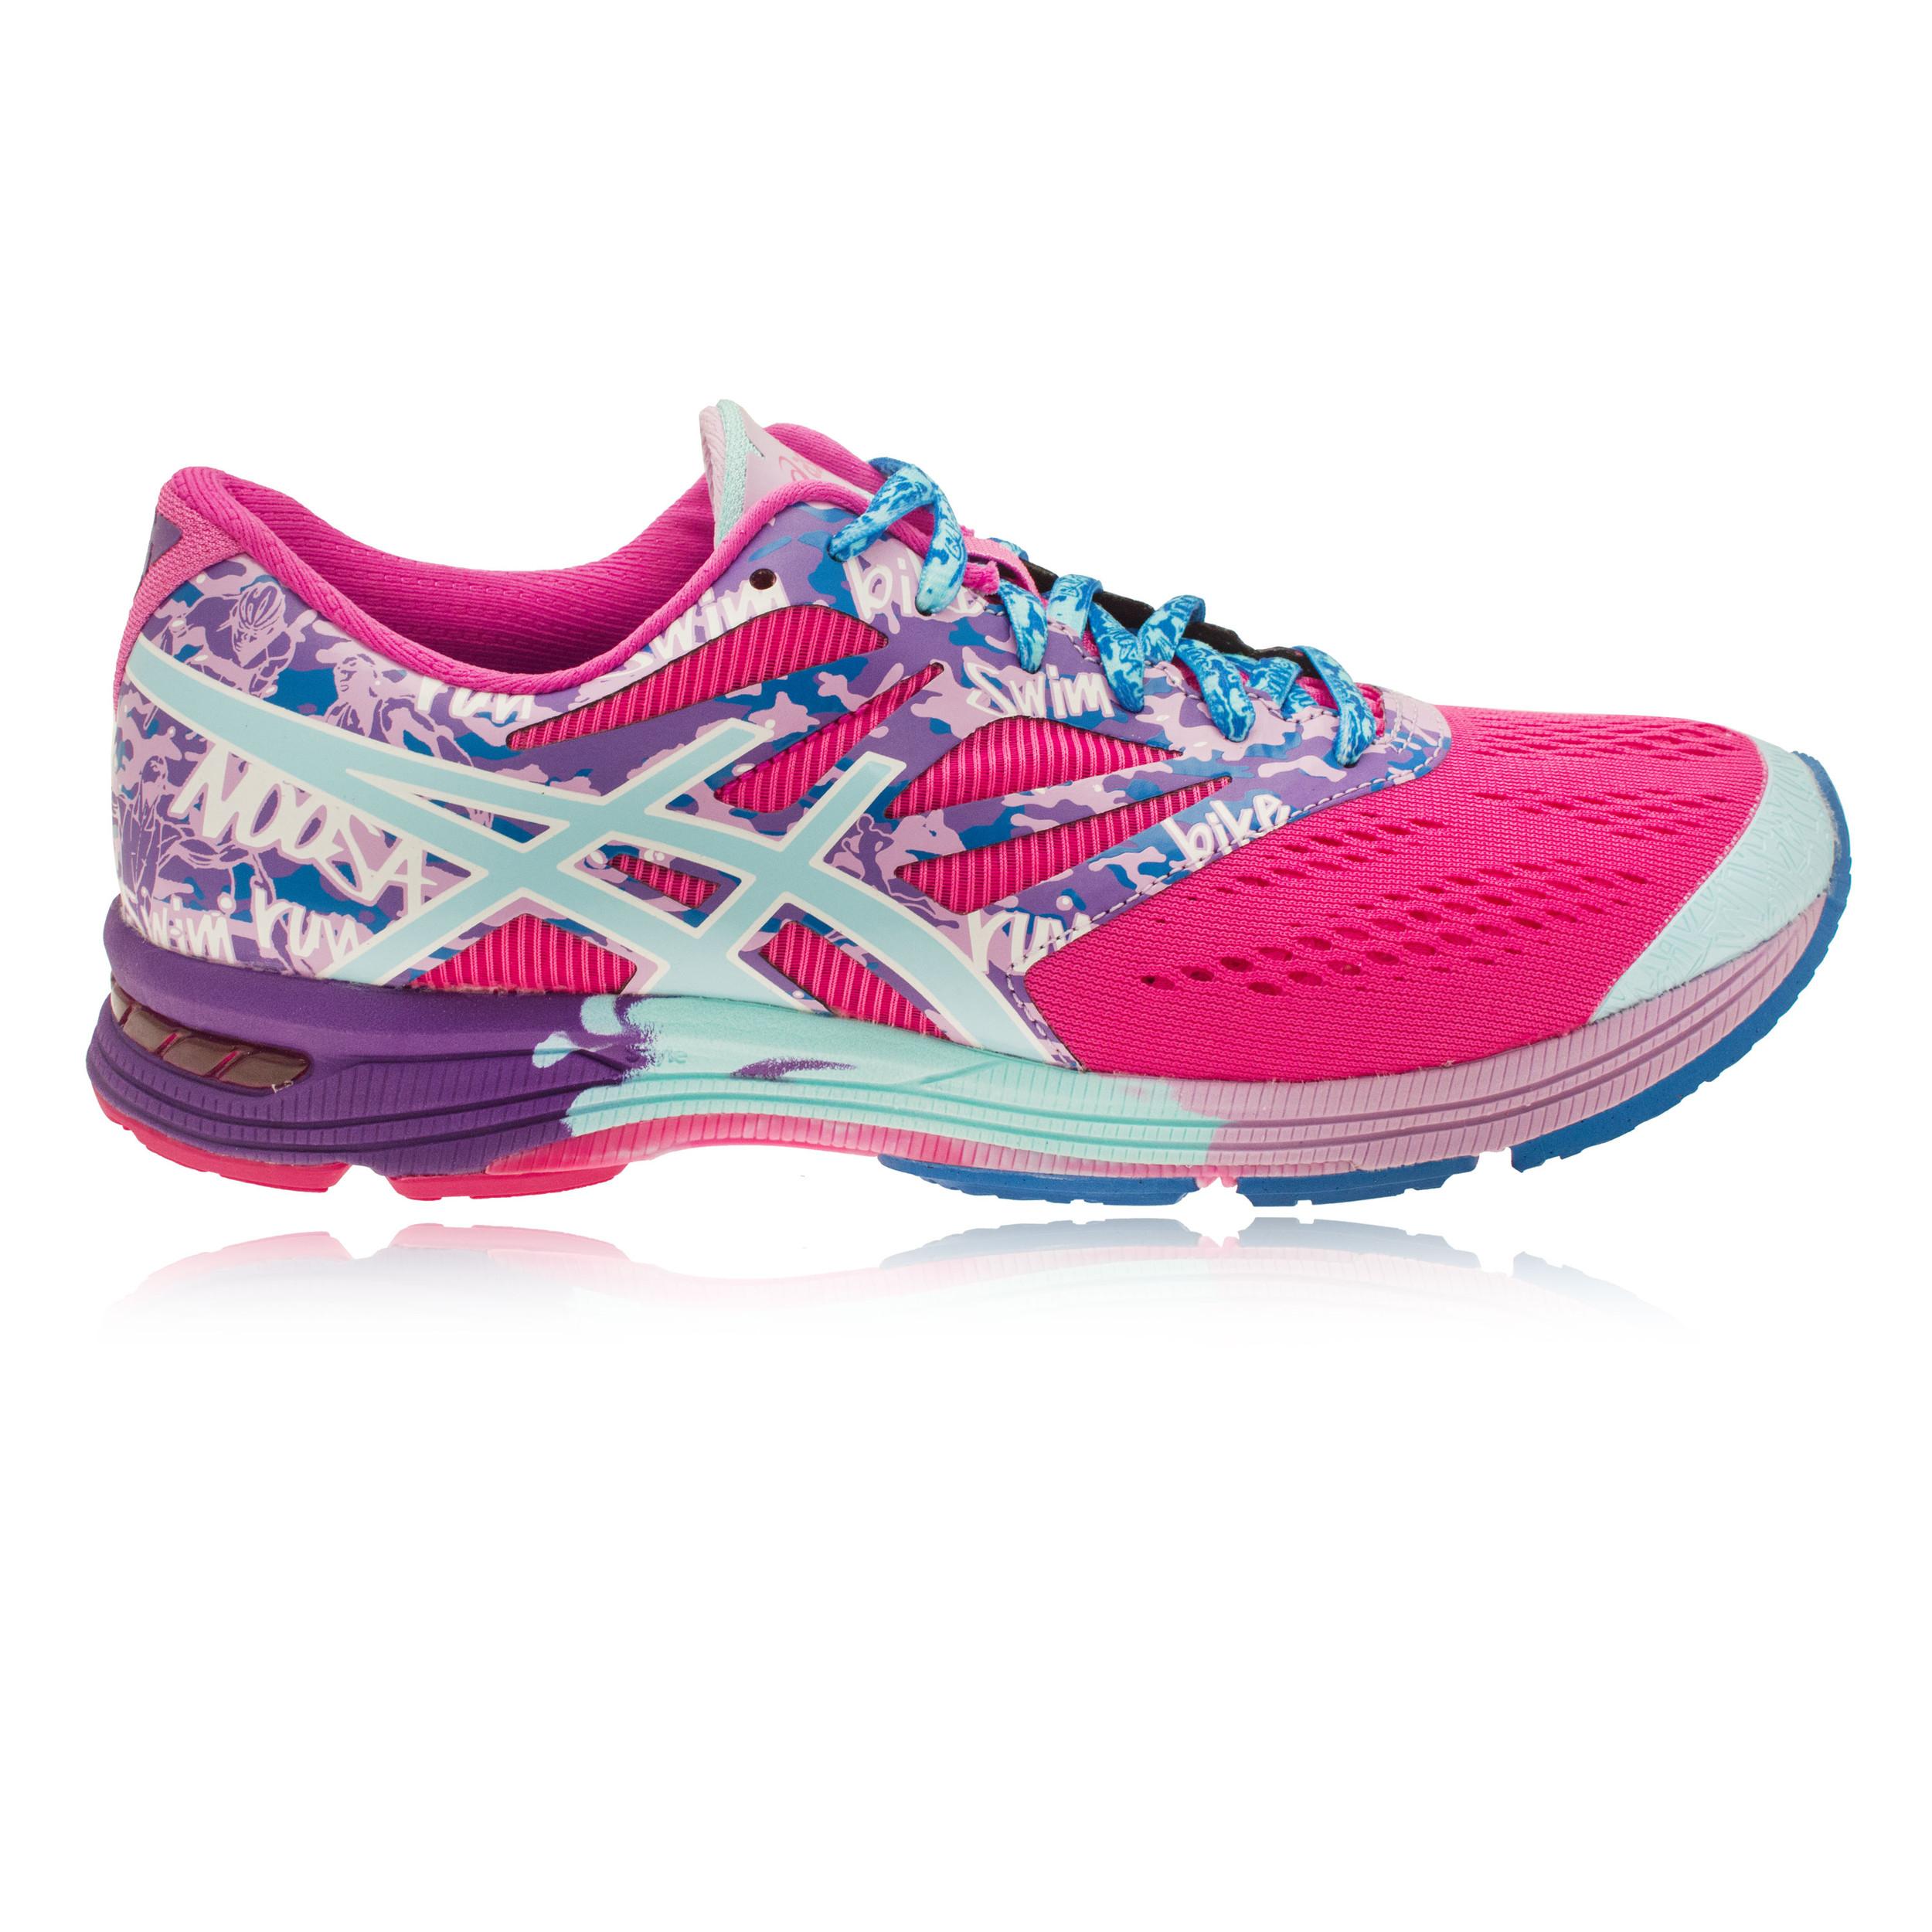 ASICS GEL-NOOSA TRI 10 Womens Pink Support Road Running